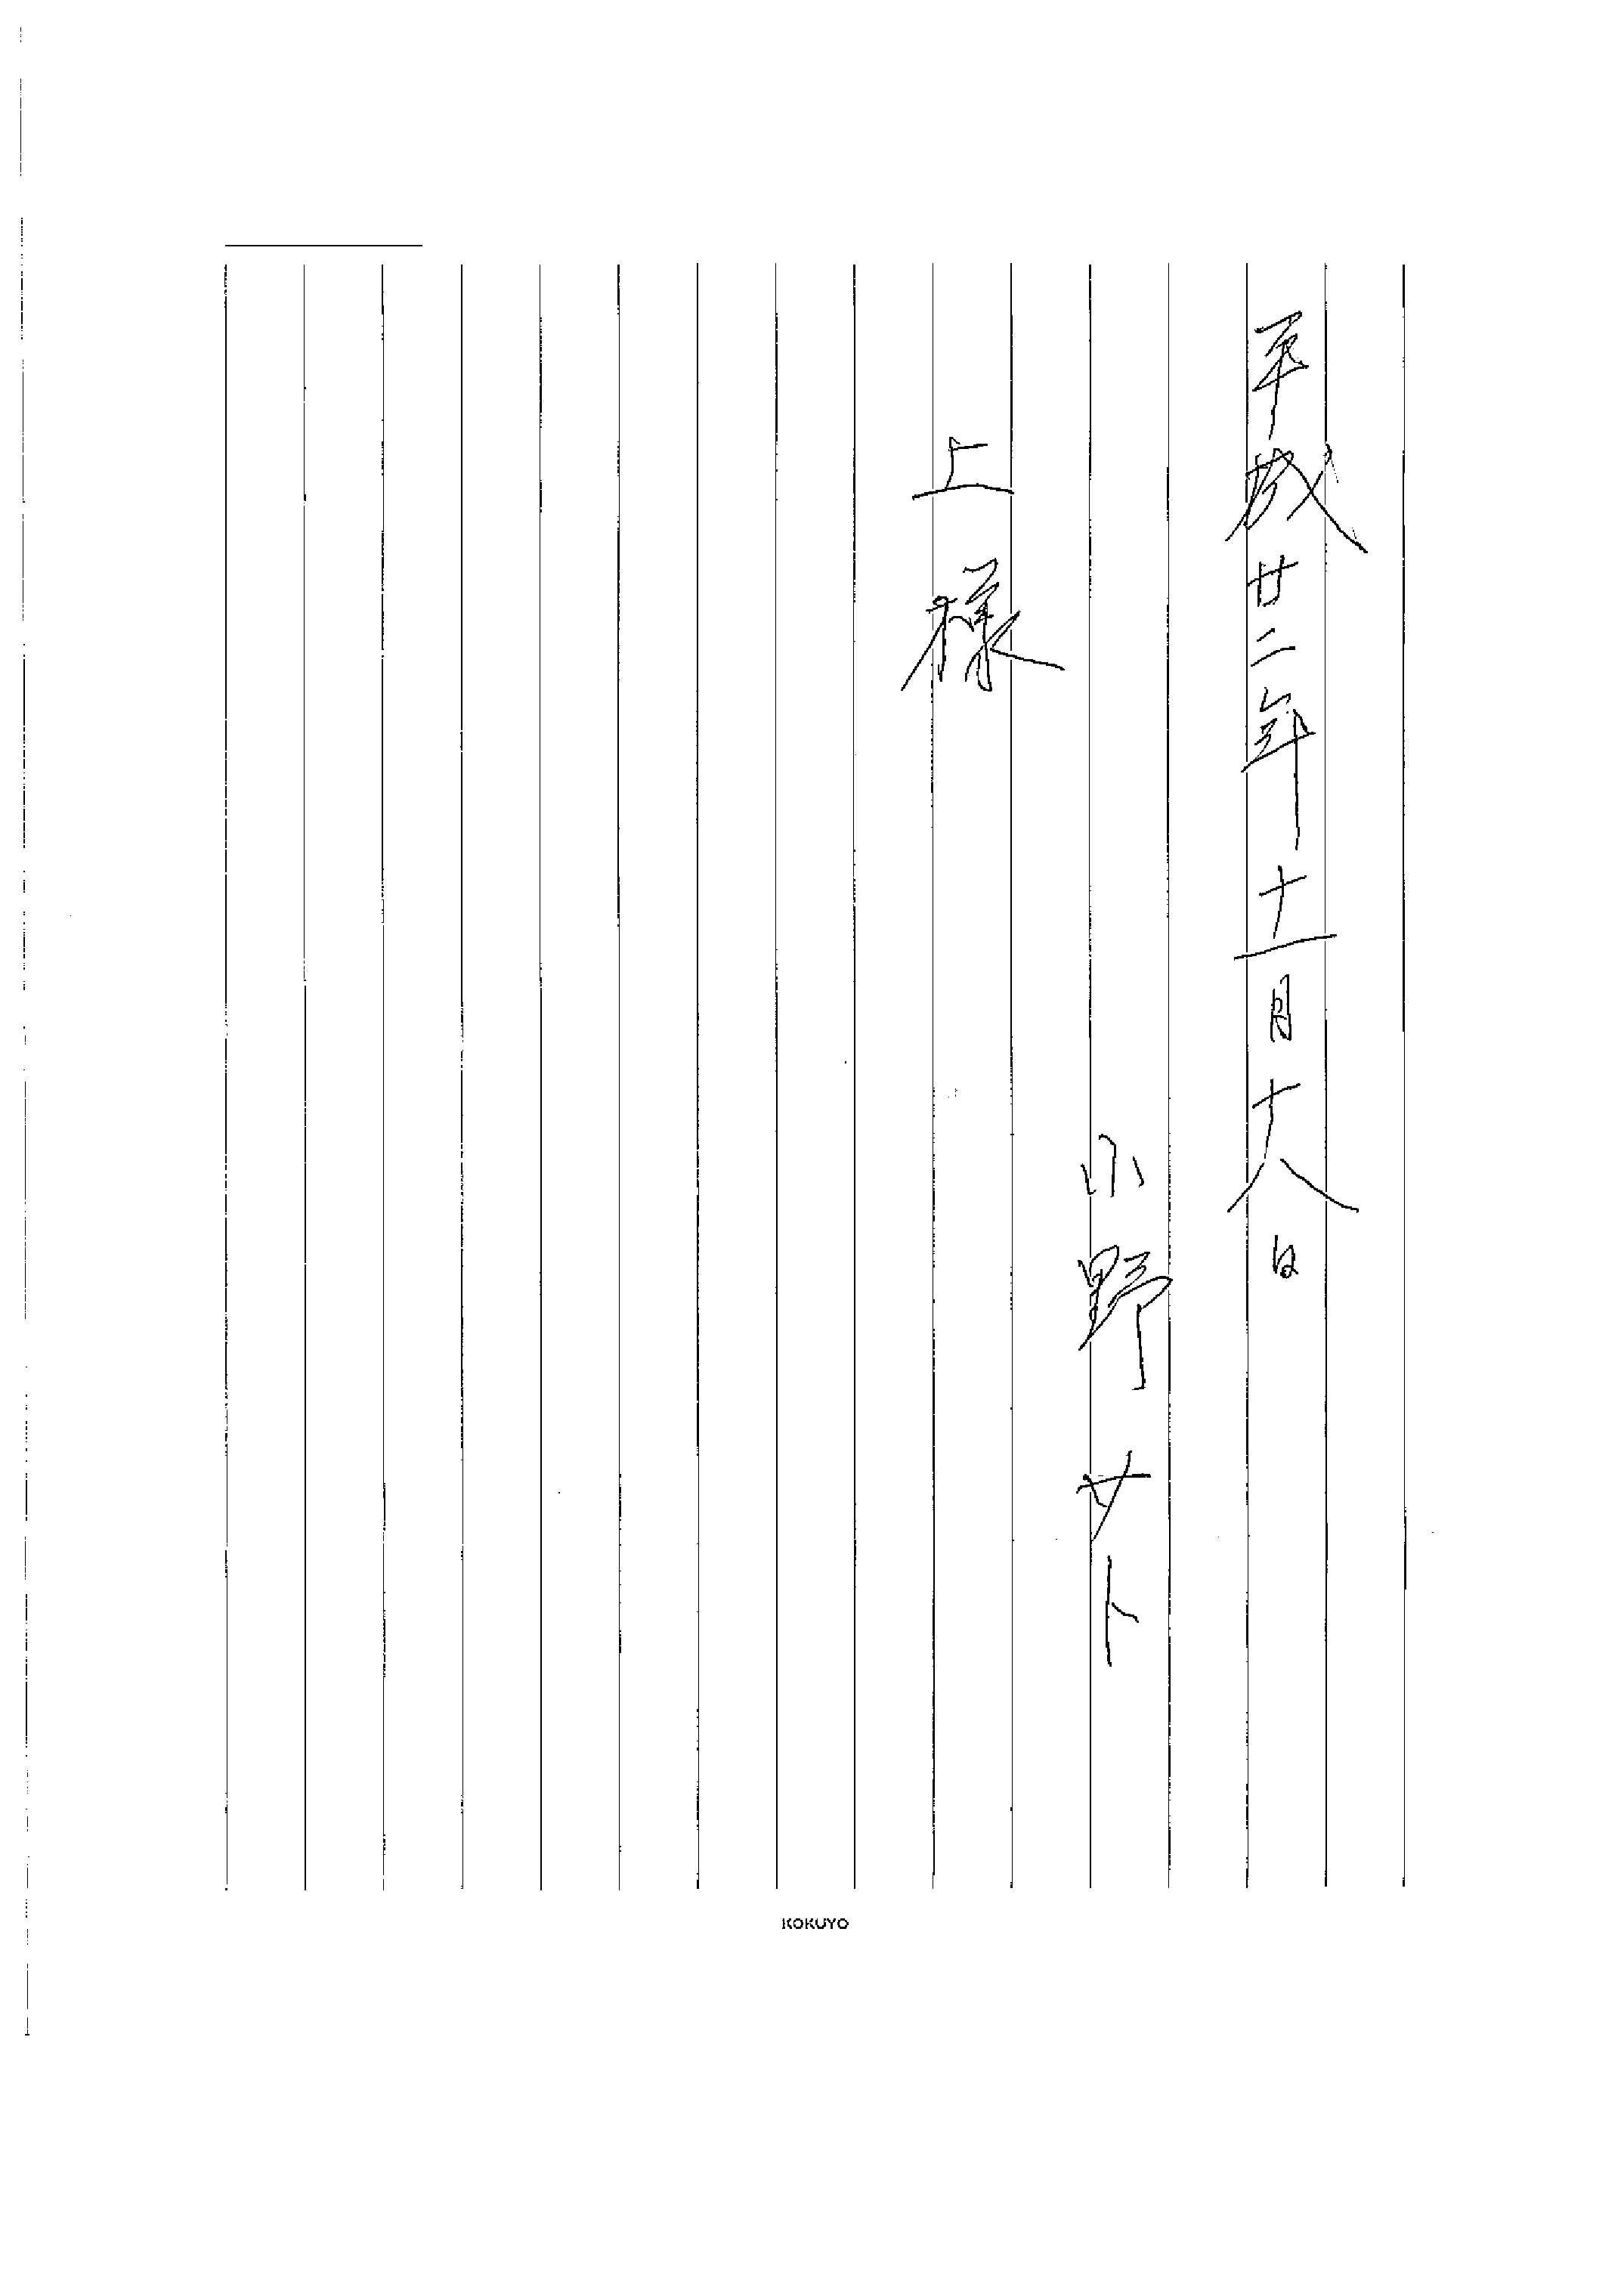 scan-251-2.jpg